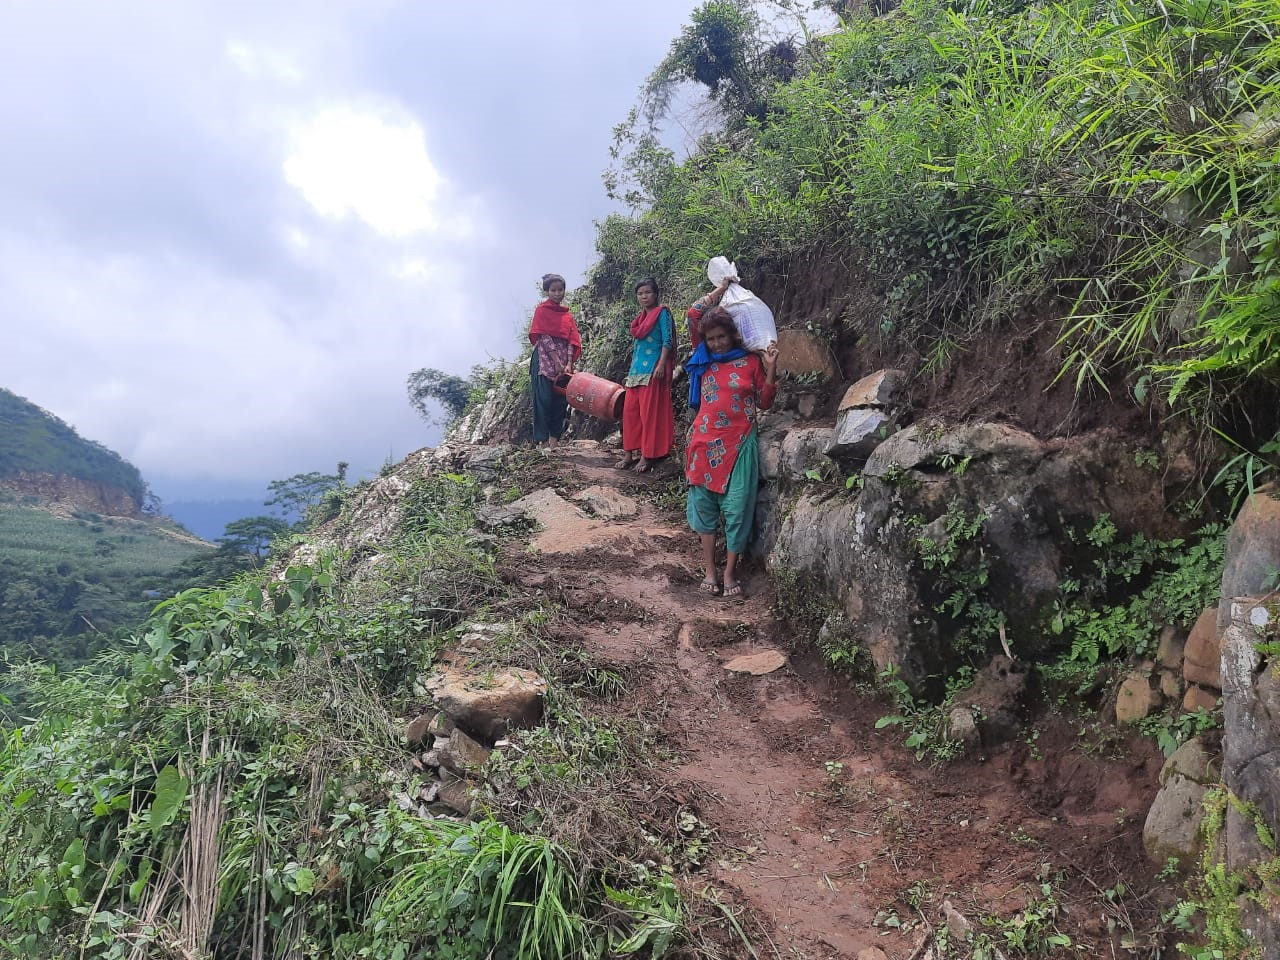 COVID-19 Pandemic Decimates Nepal's Christian Leadership   Persecution